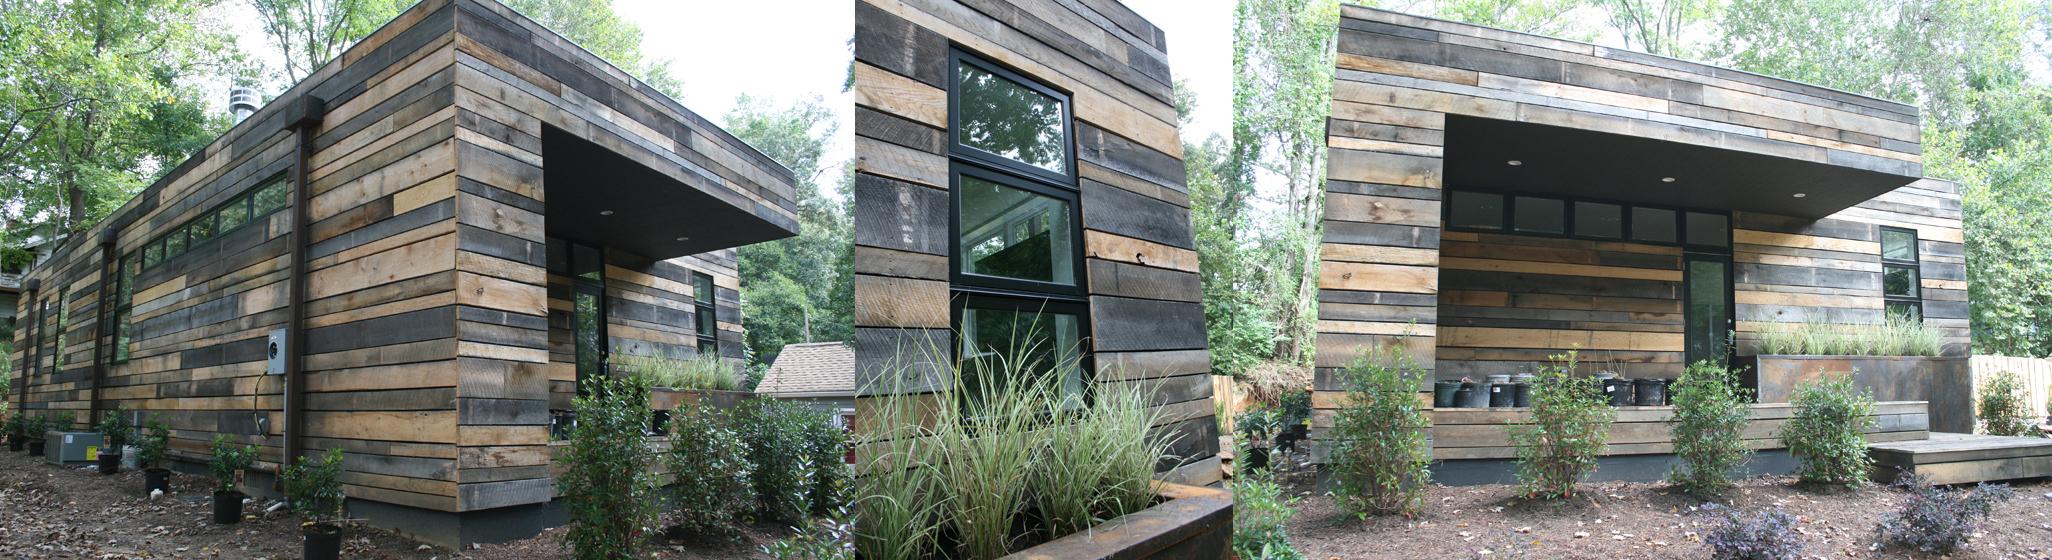 a rustic modern exterior